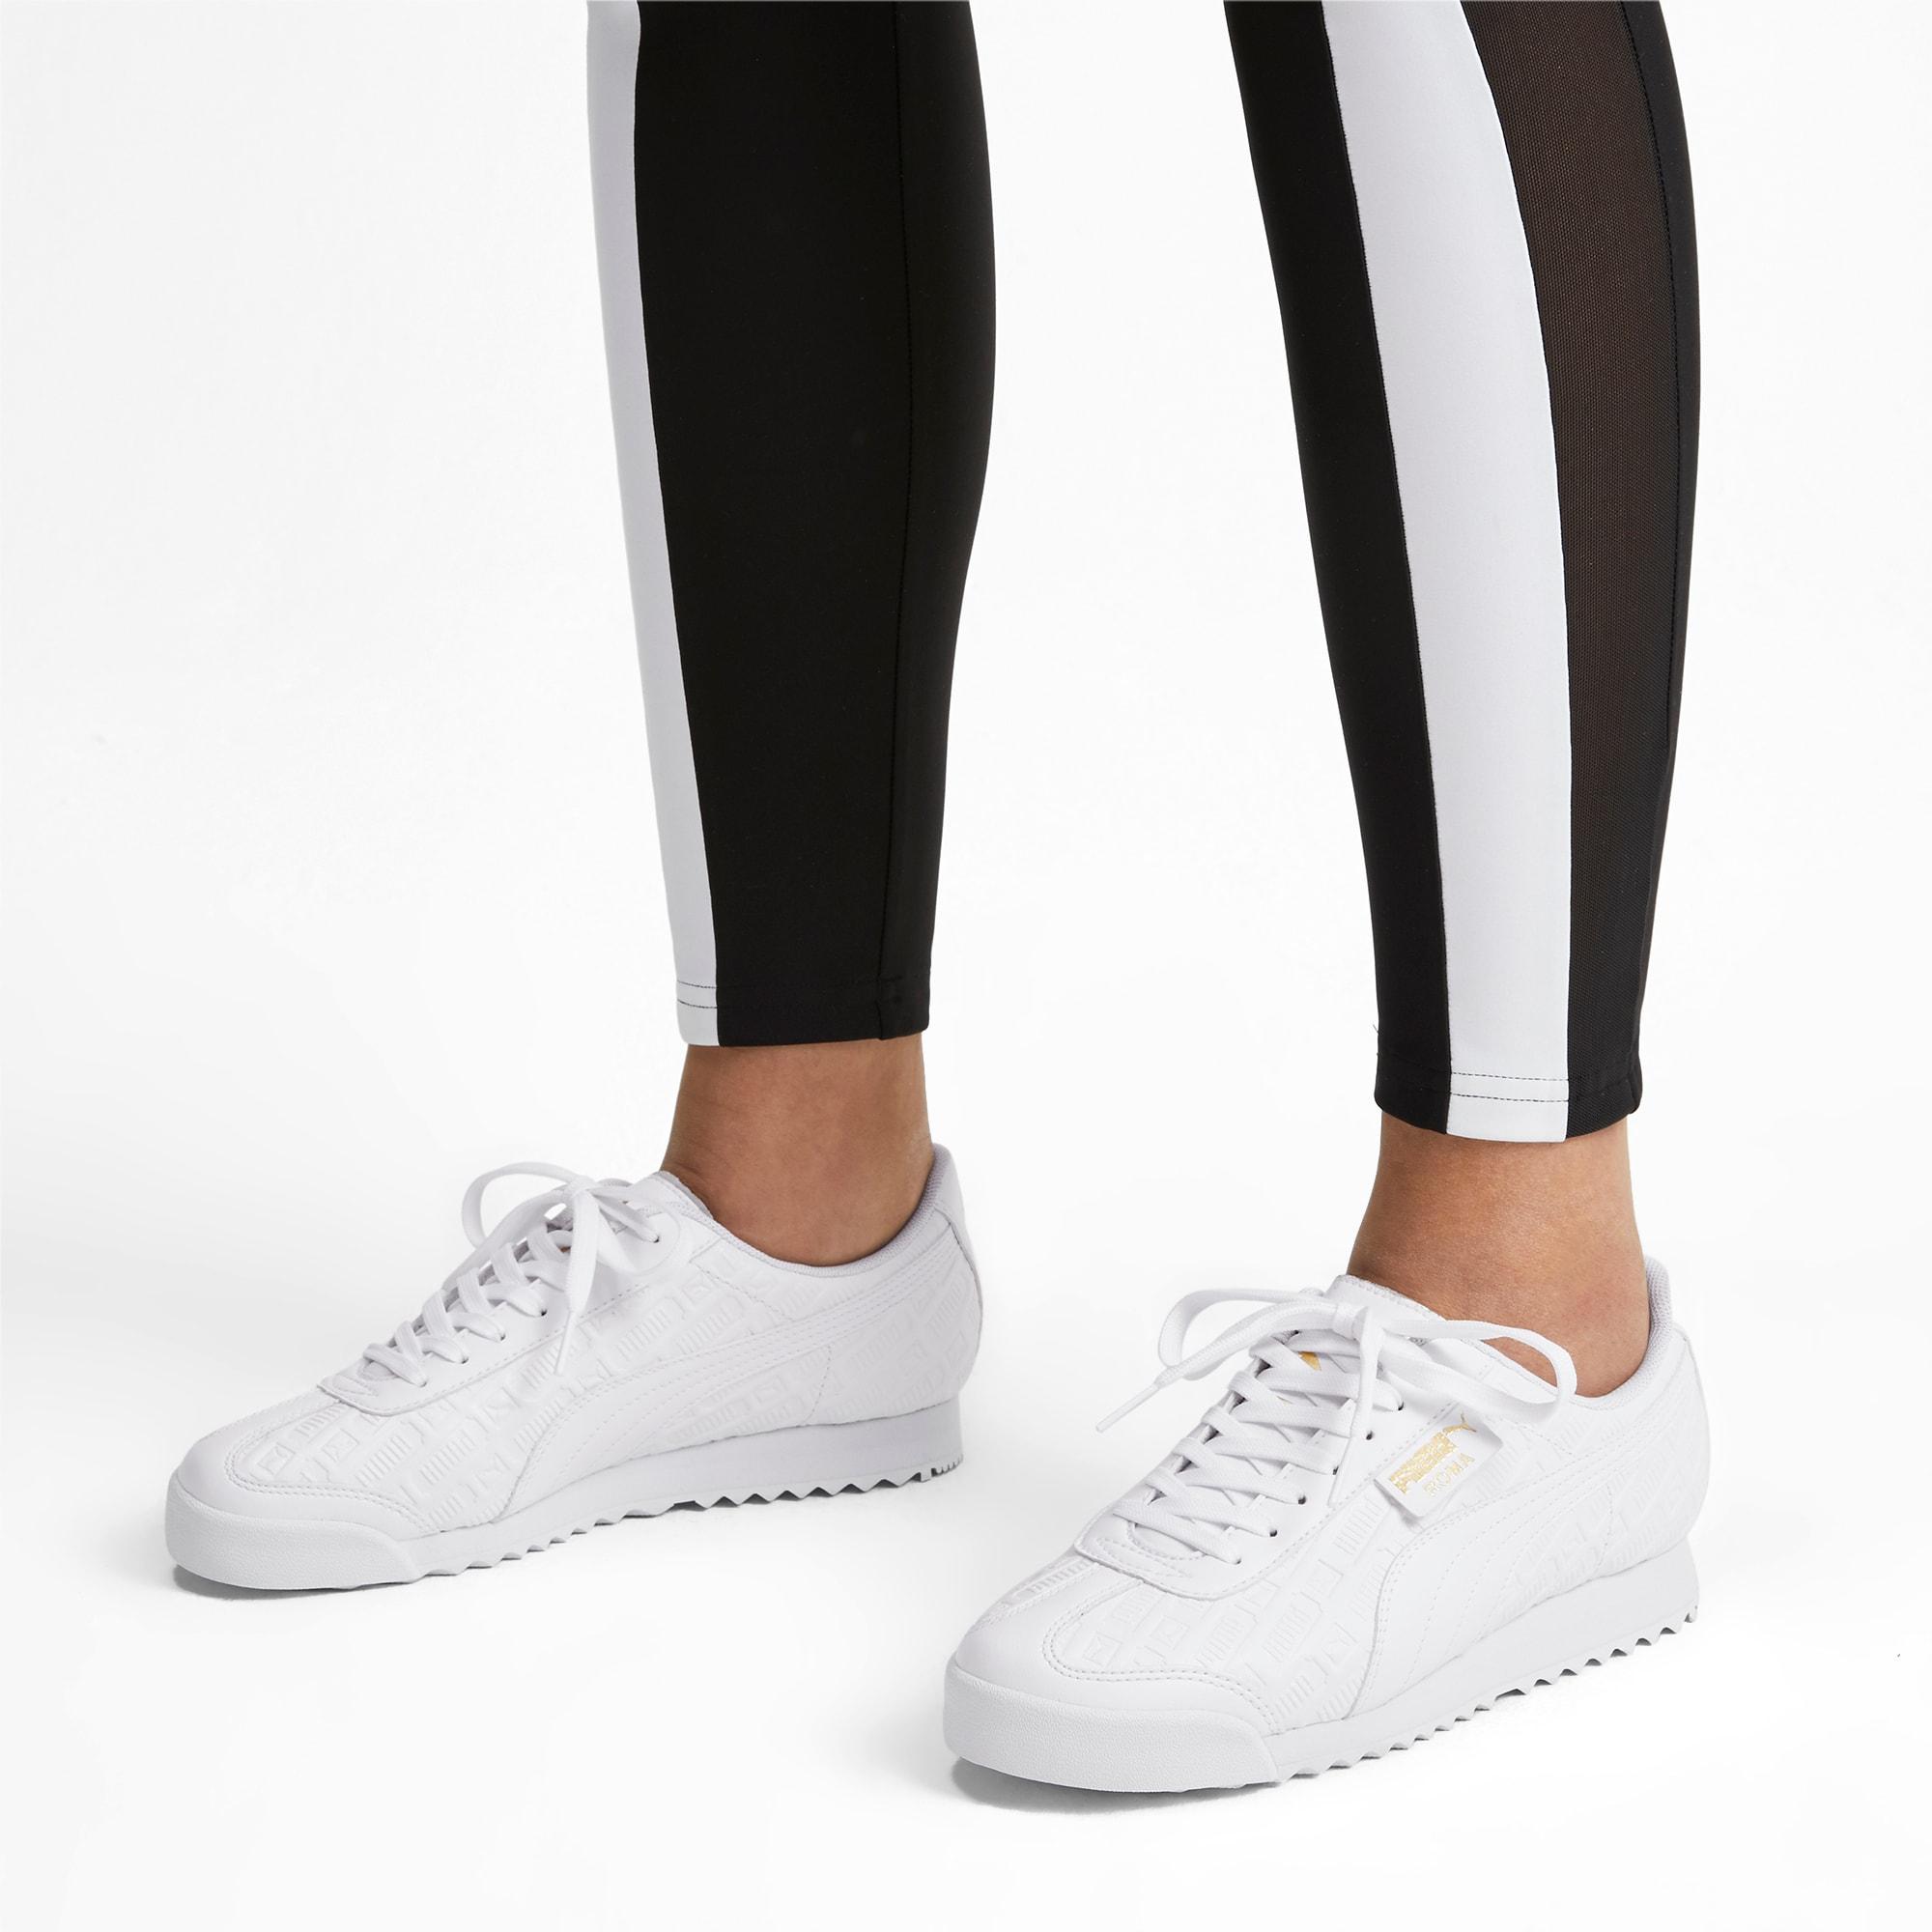 Scarpe da ginnastica Roma Reinvent donna